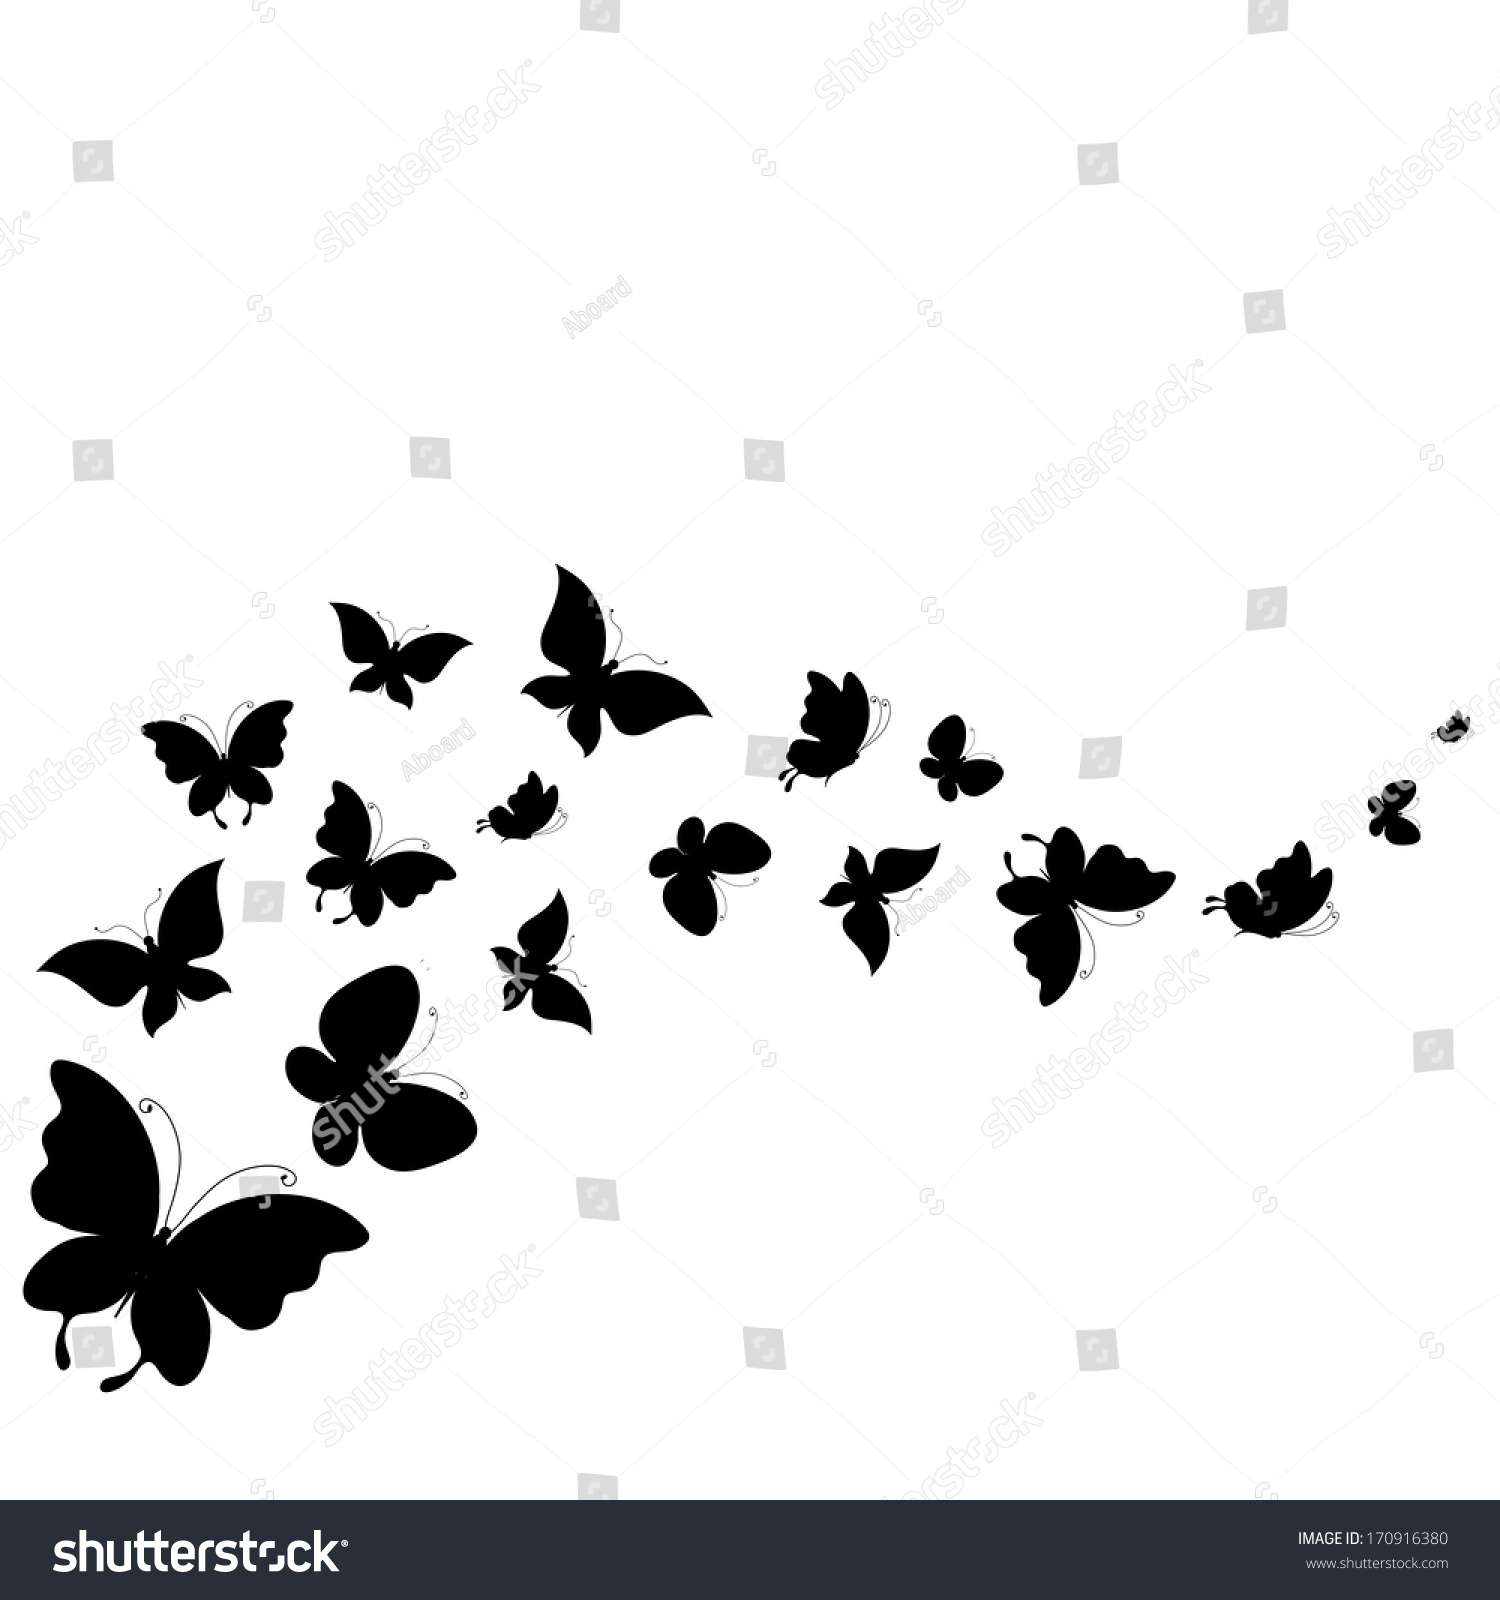 butterflies design stock vector 170916380 shutterstock. Black Bedroom Furniture Sets. Home Design Ideas